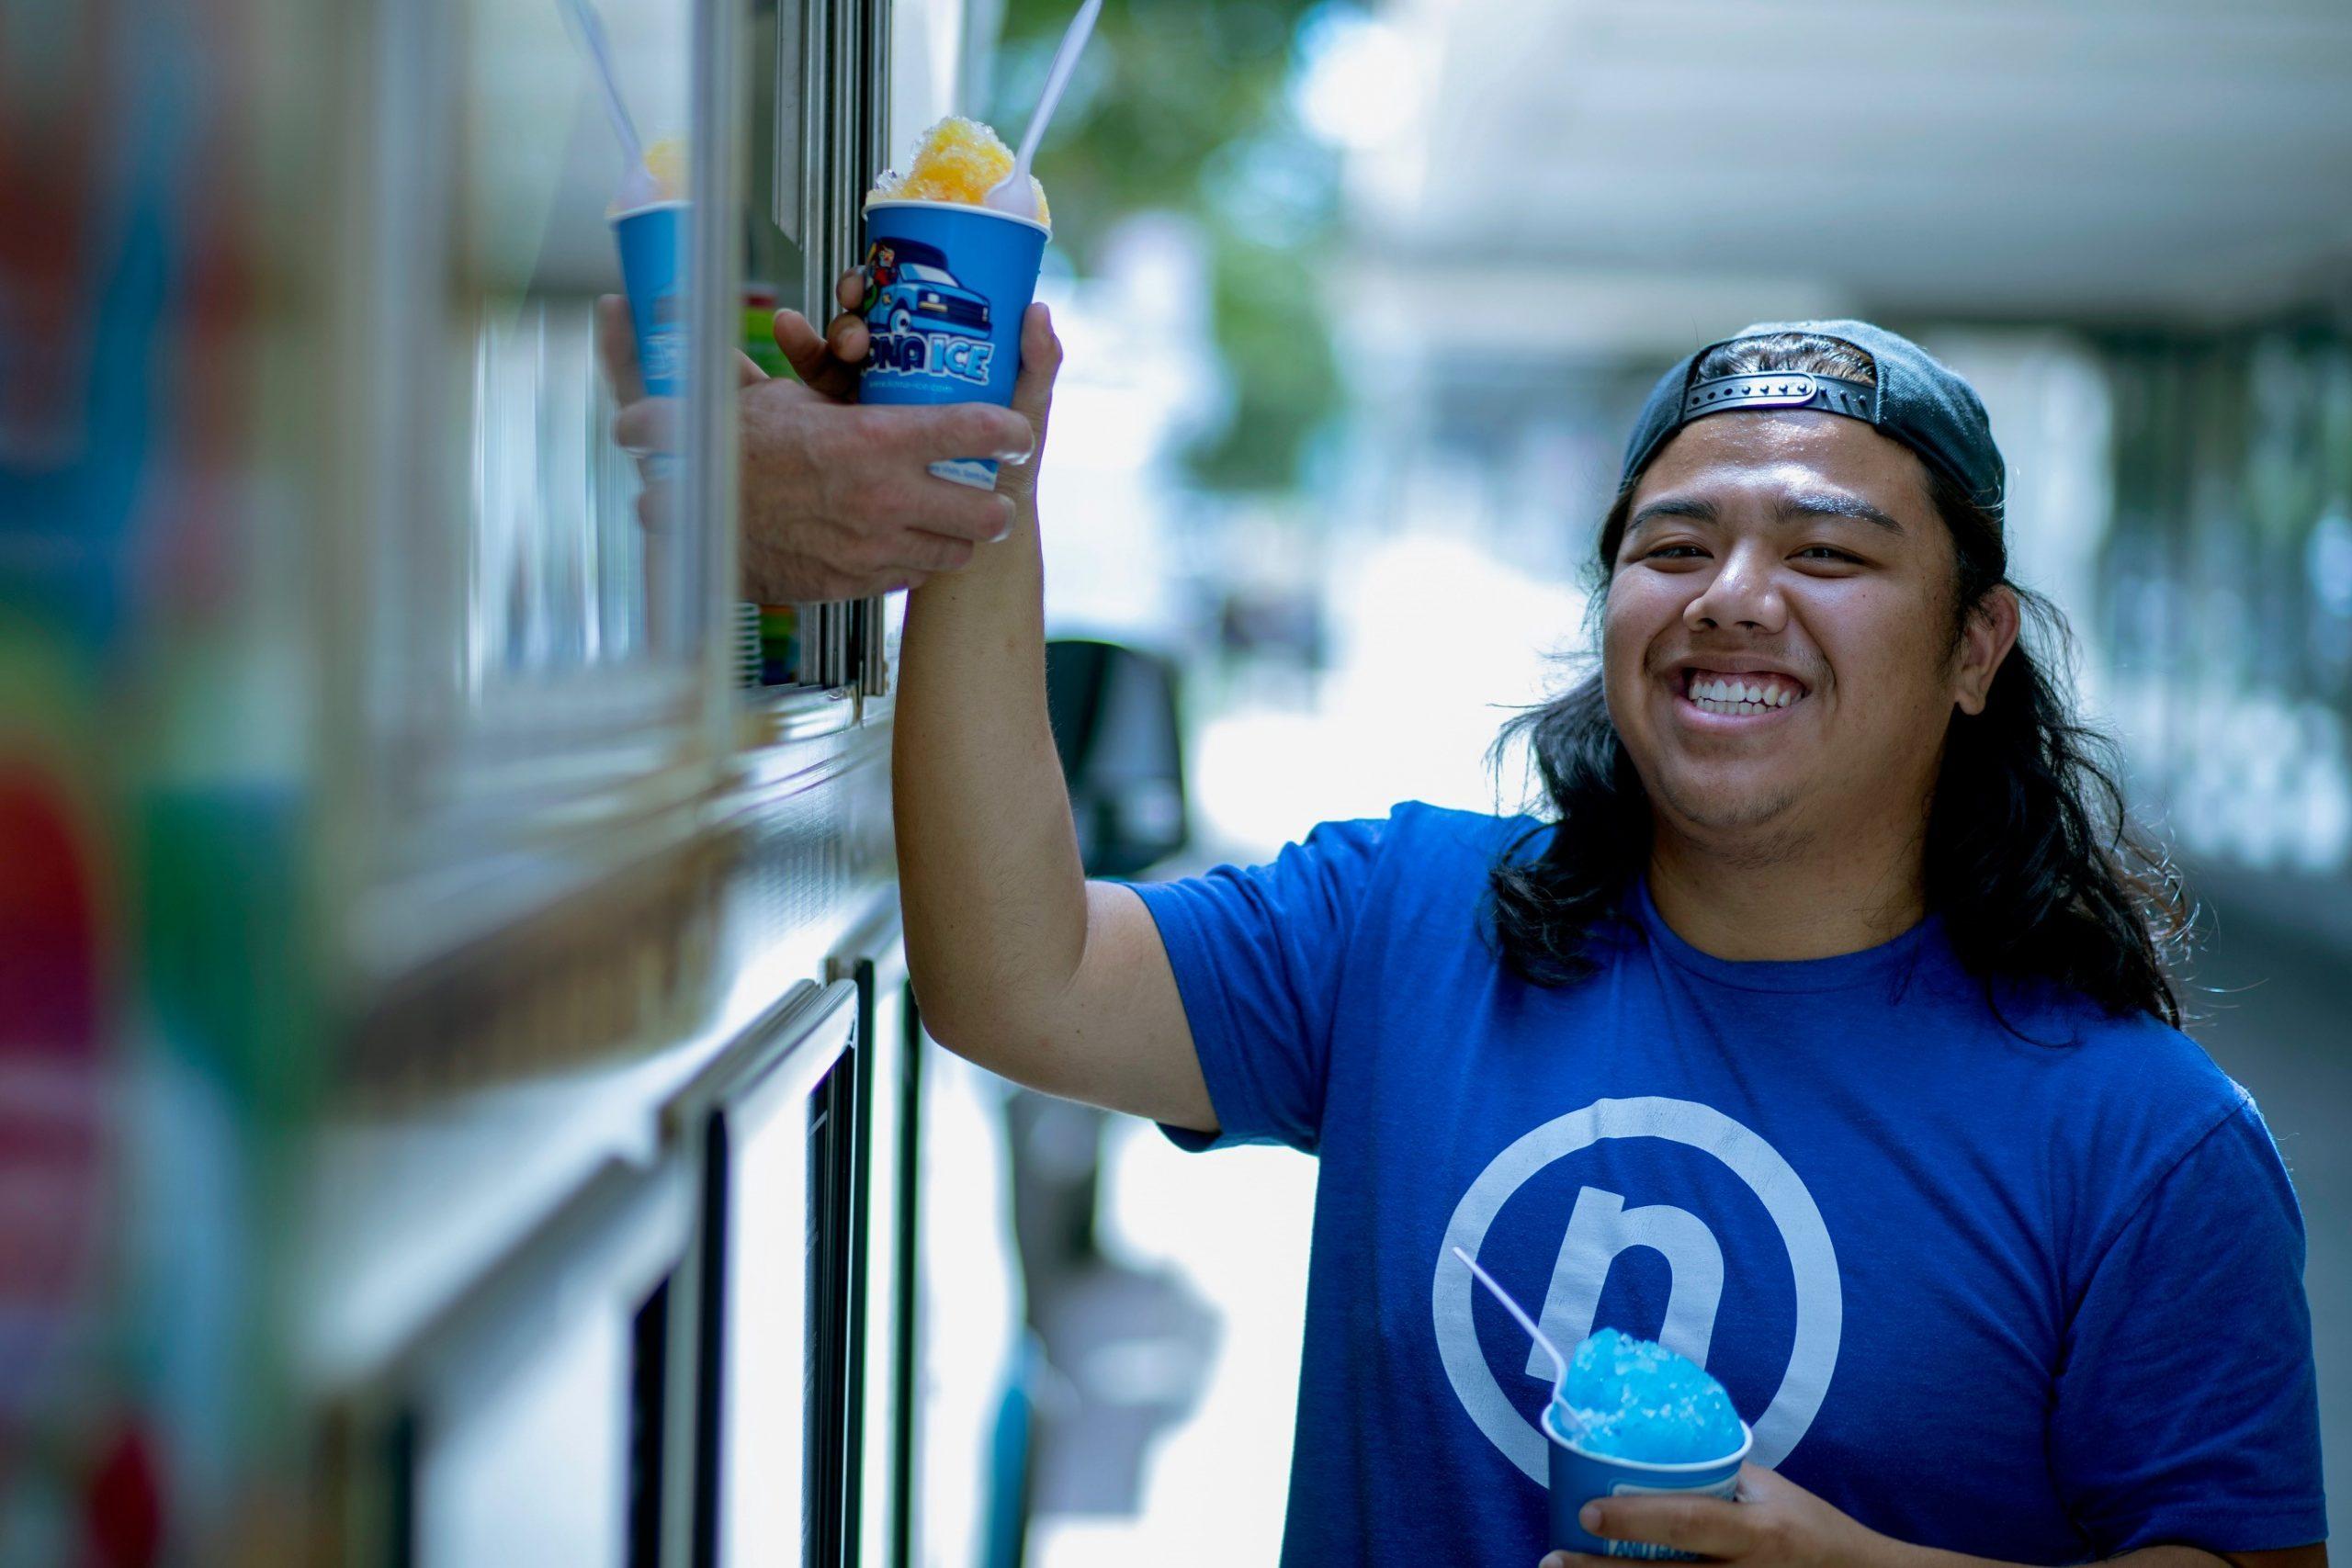 Nelnet associate at food truck receiving Kona shaved ice